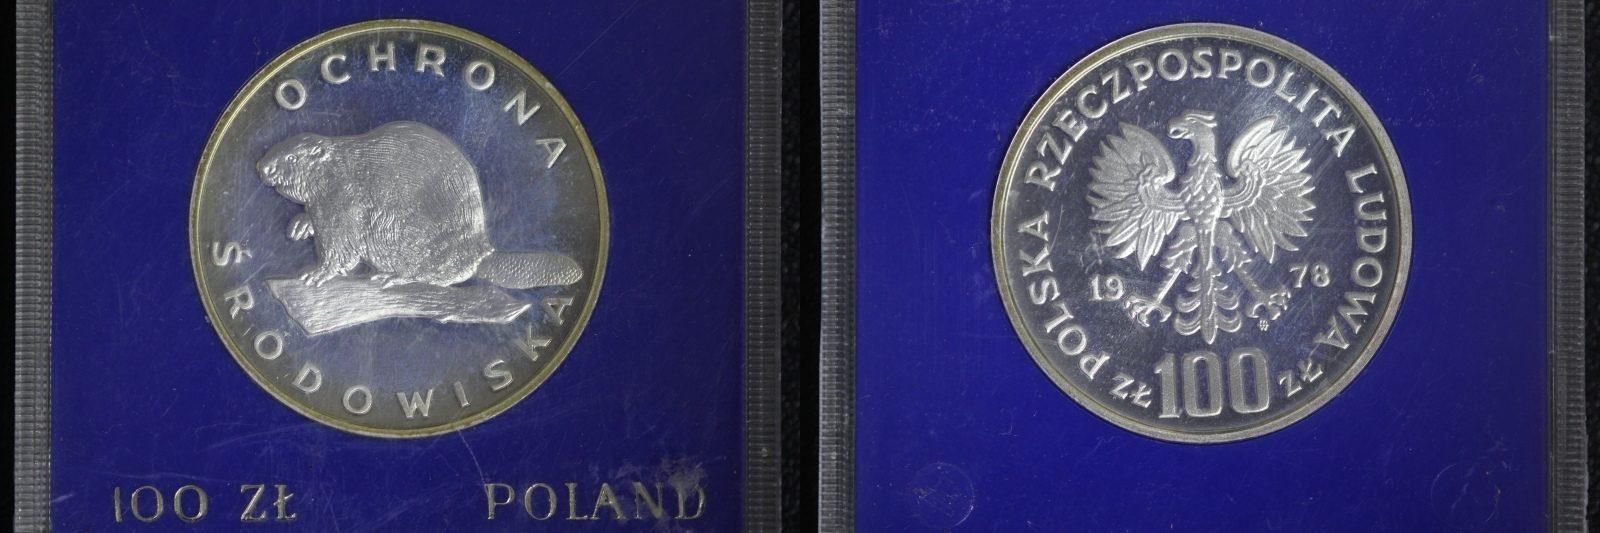 100 Zloty 1978 Polen Serie Umweltschutz - Biber PP/ l.Patina